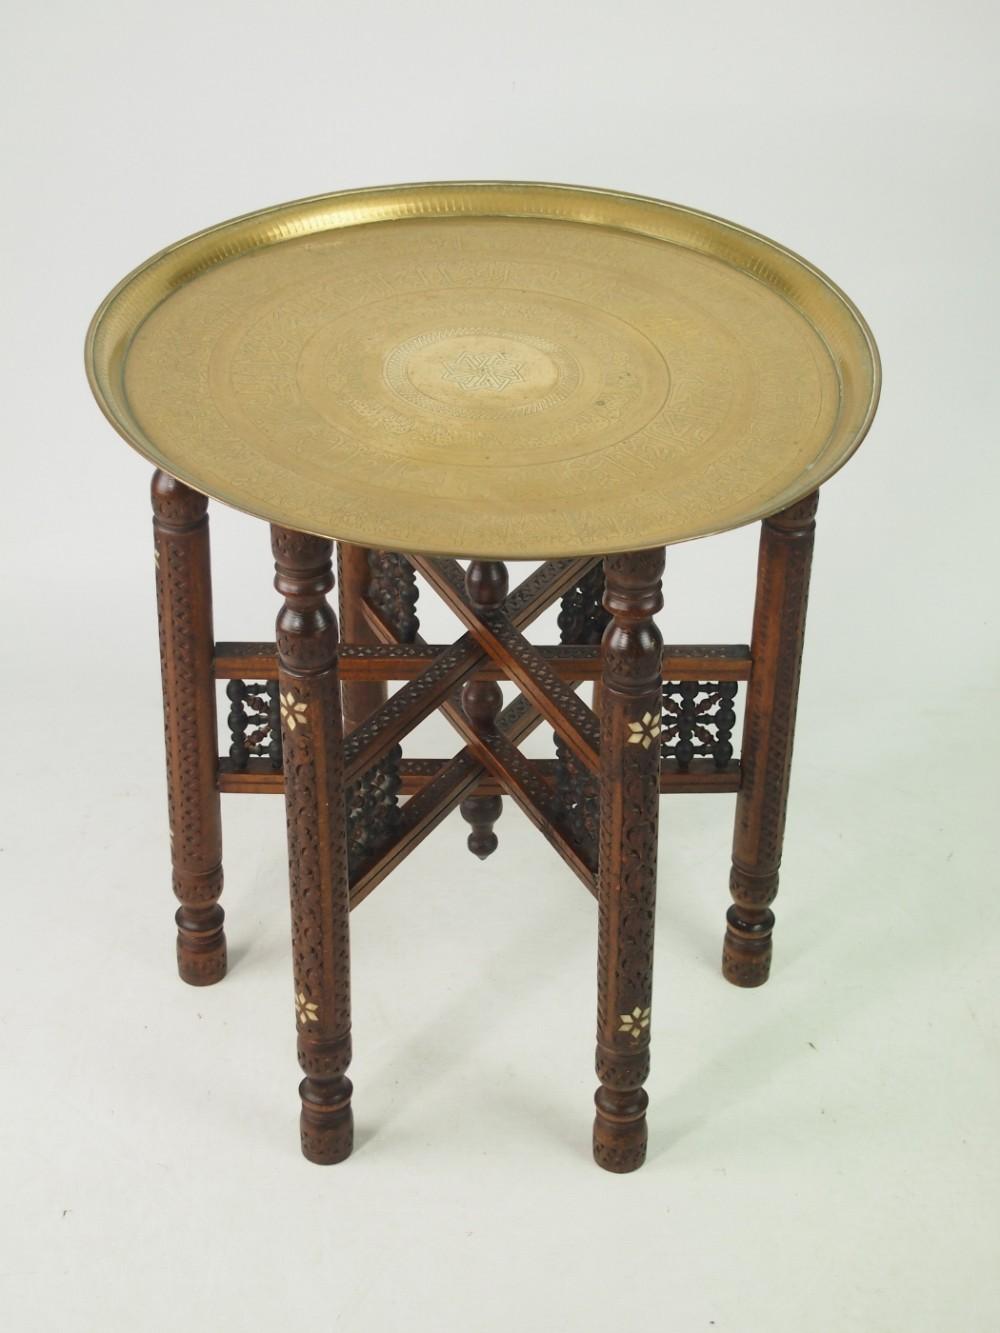 berber benares brass tray top coffee table 439555. Black Bedroom Furniture Sets. Home Design Ideas